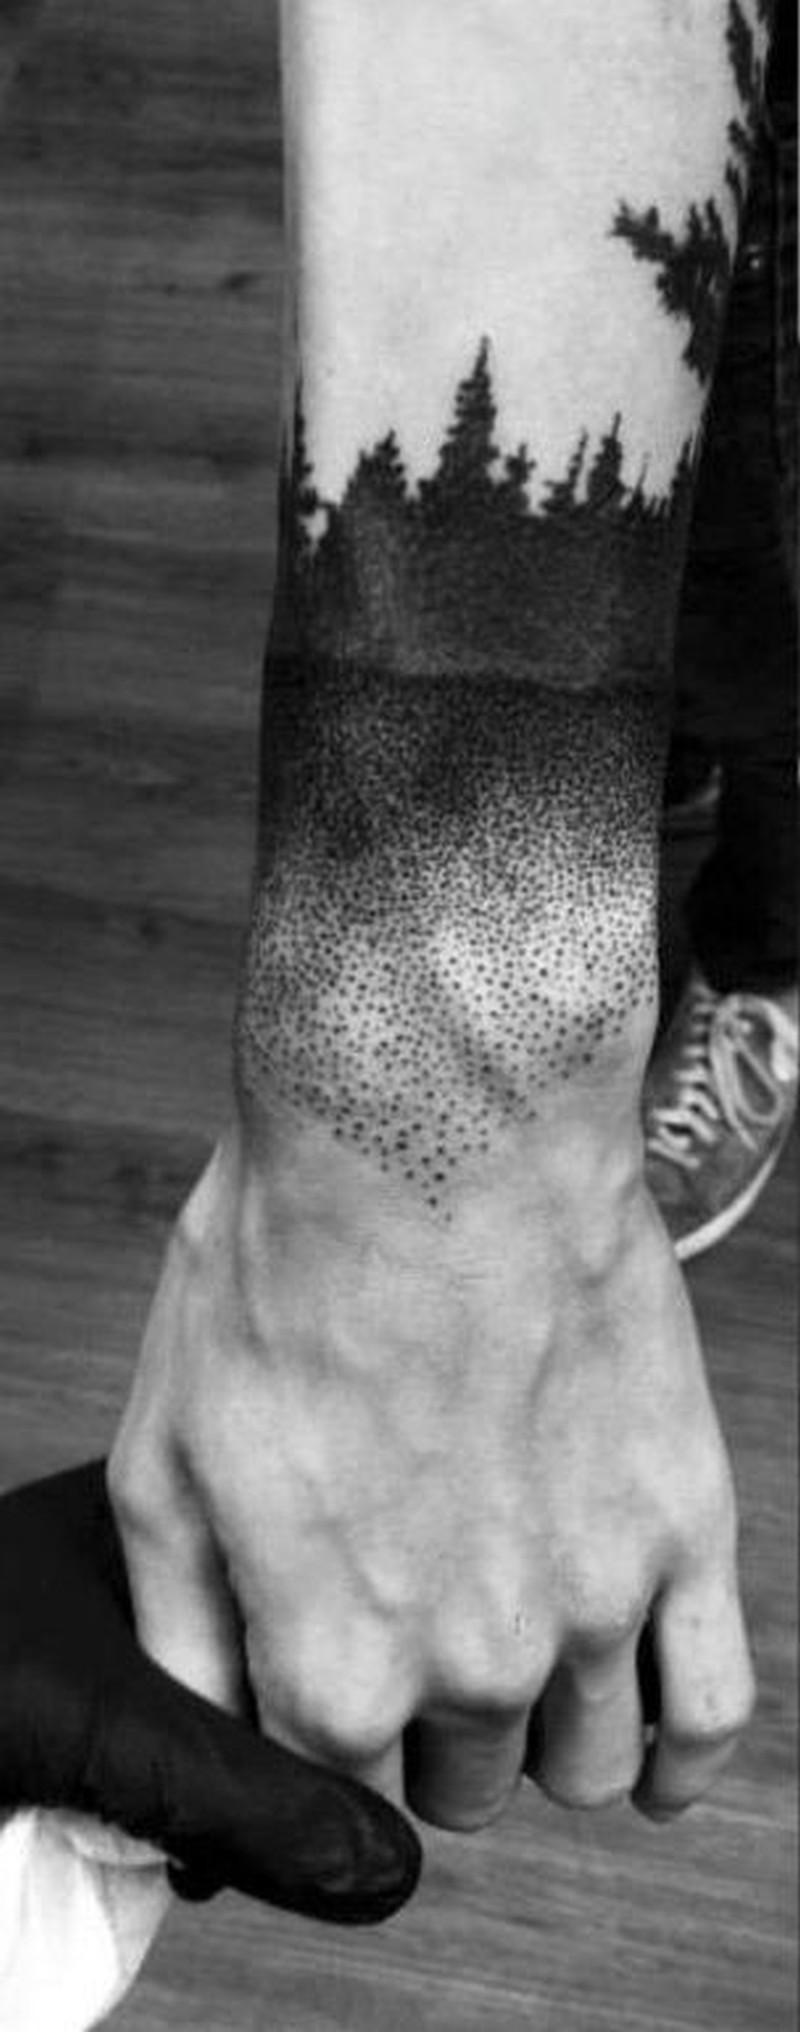 Amasing black forest wrist tattoo